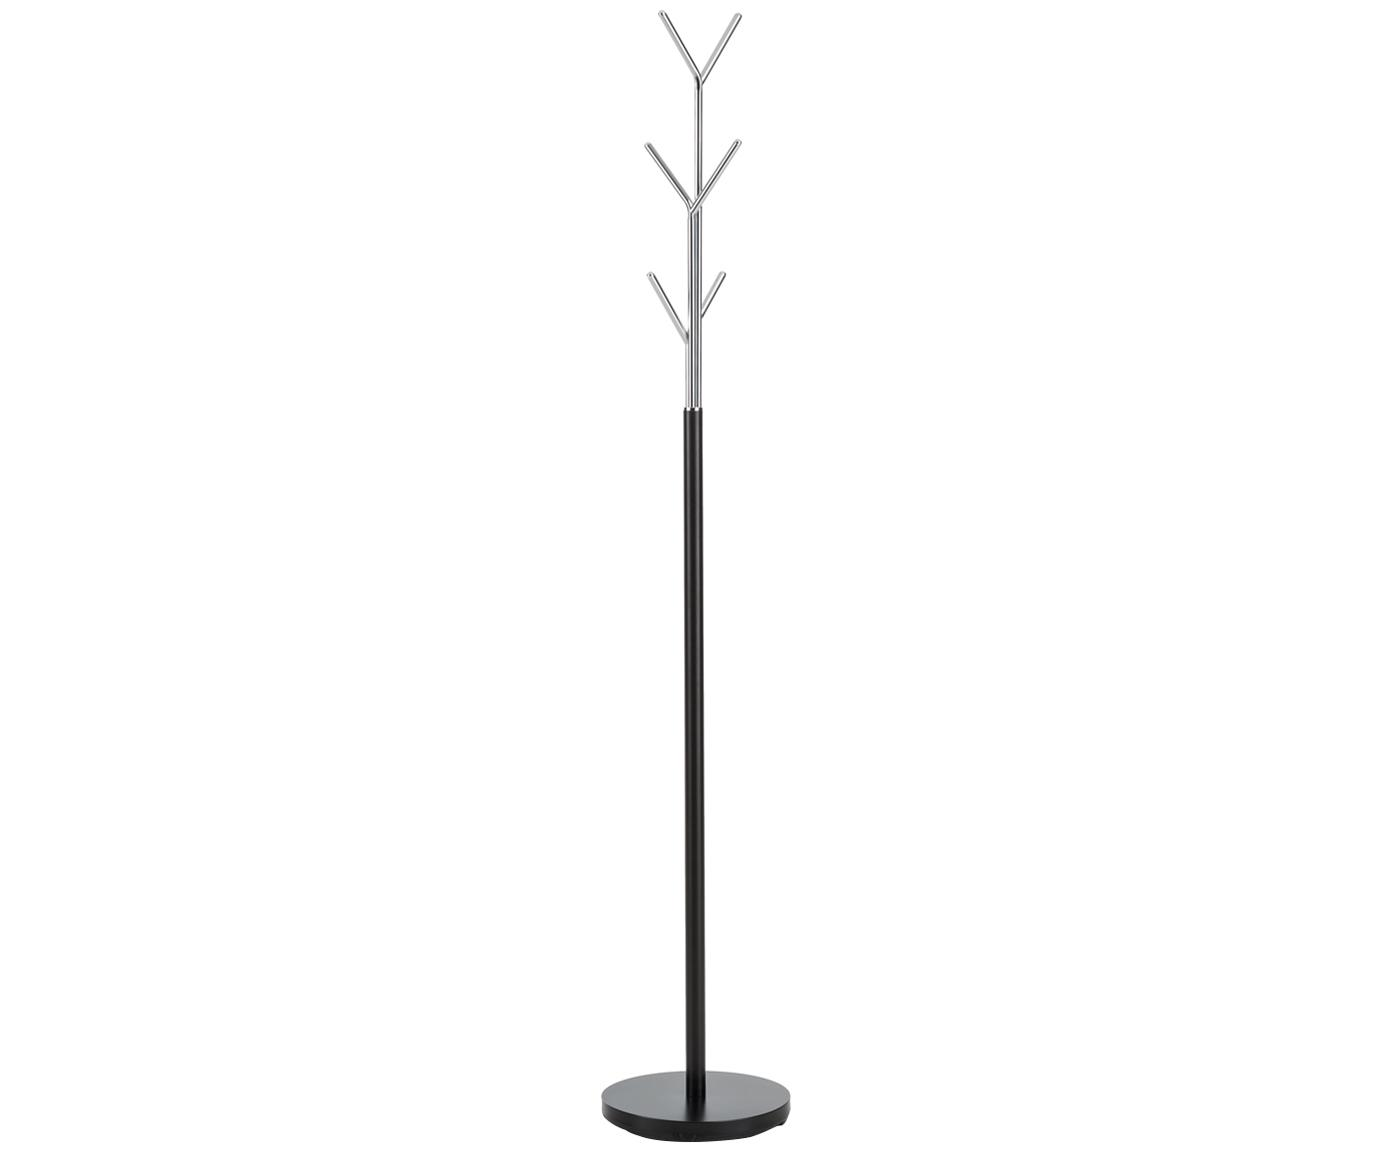 Kapstok London, Frame: gepoedercoat staal, Zwart, chroomkleurig, Ø 31 x H 177 cm